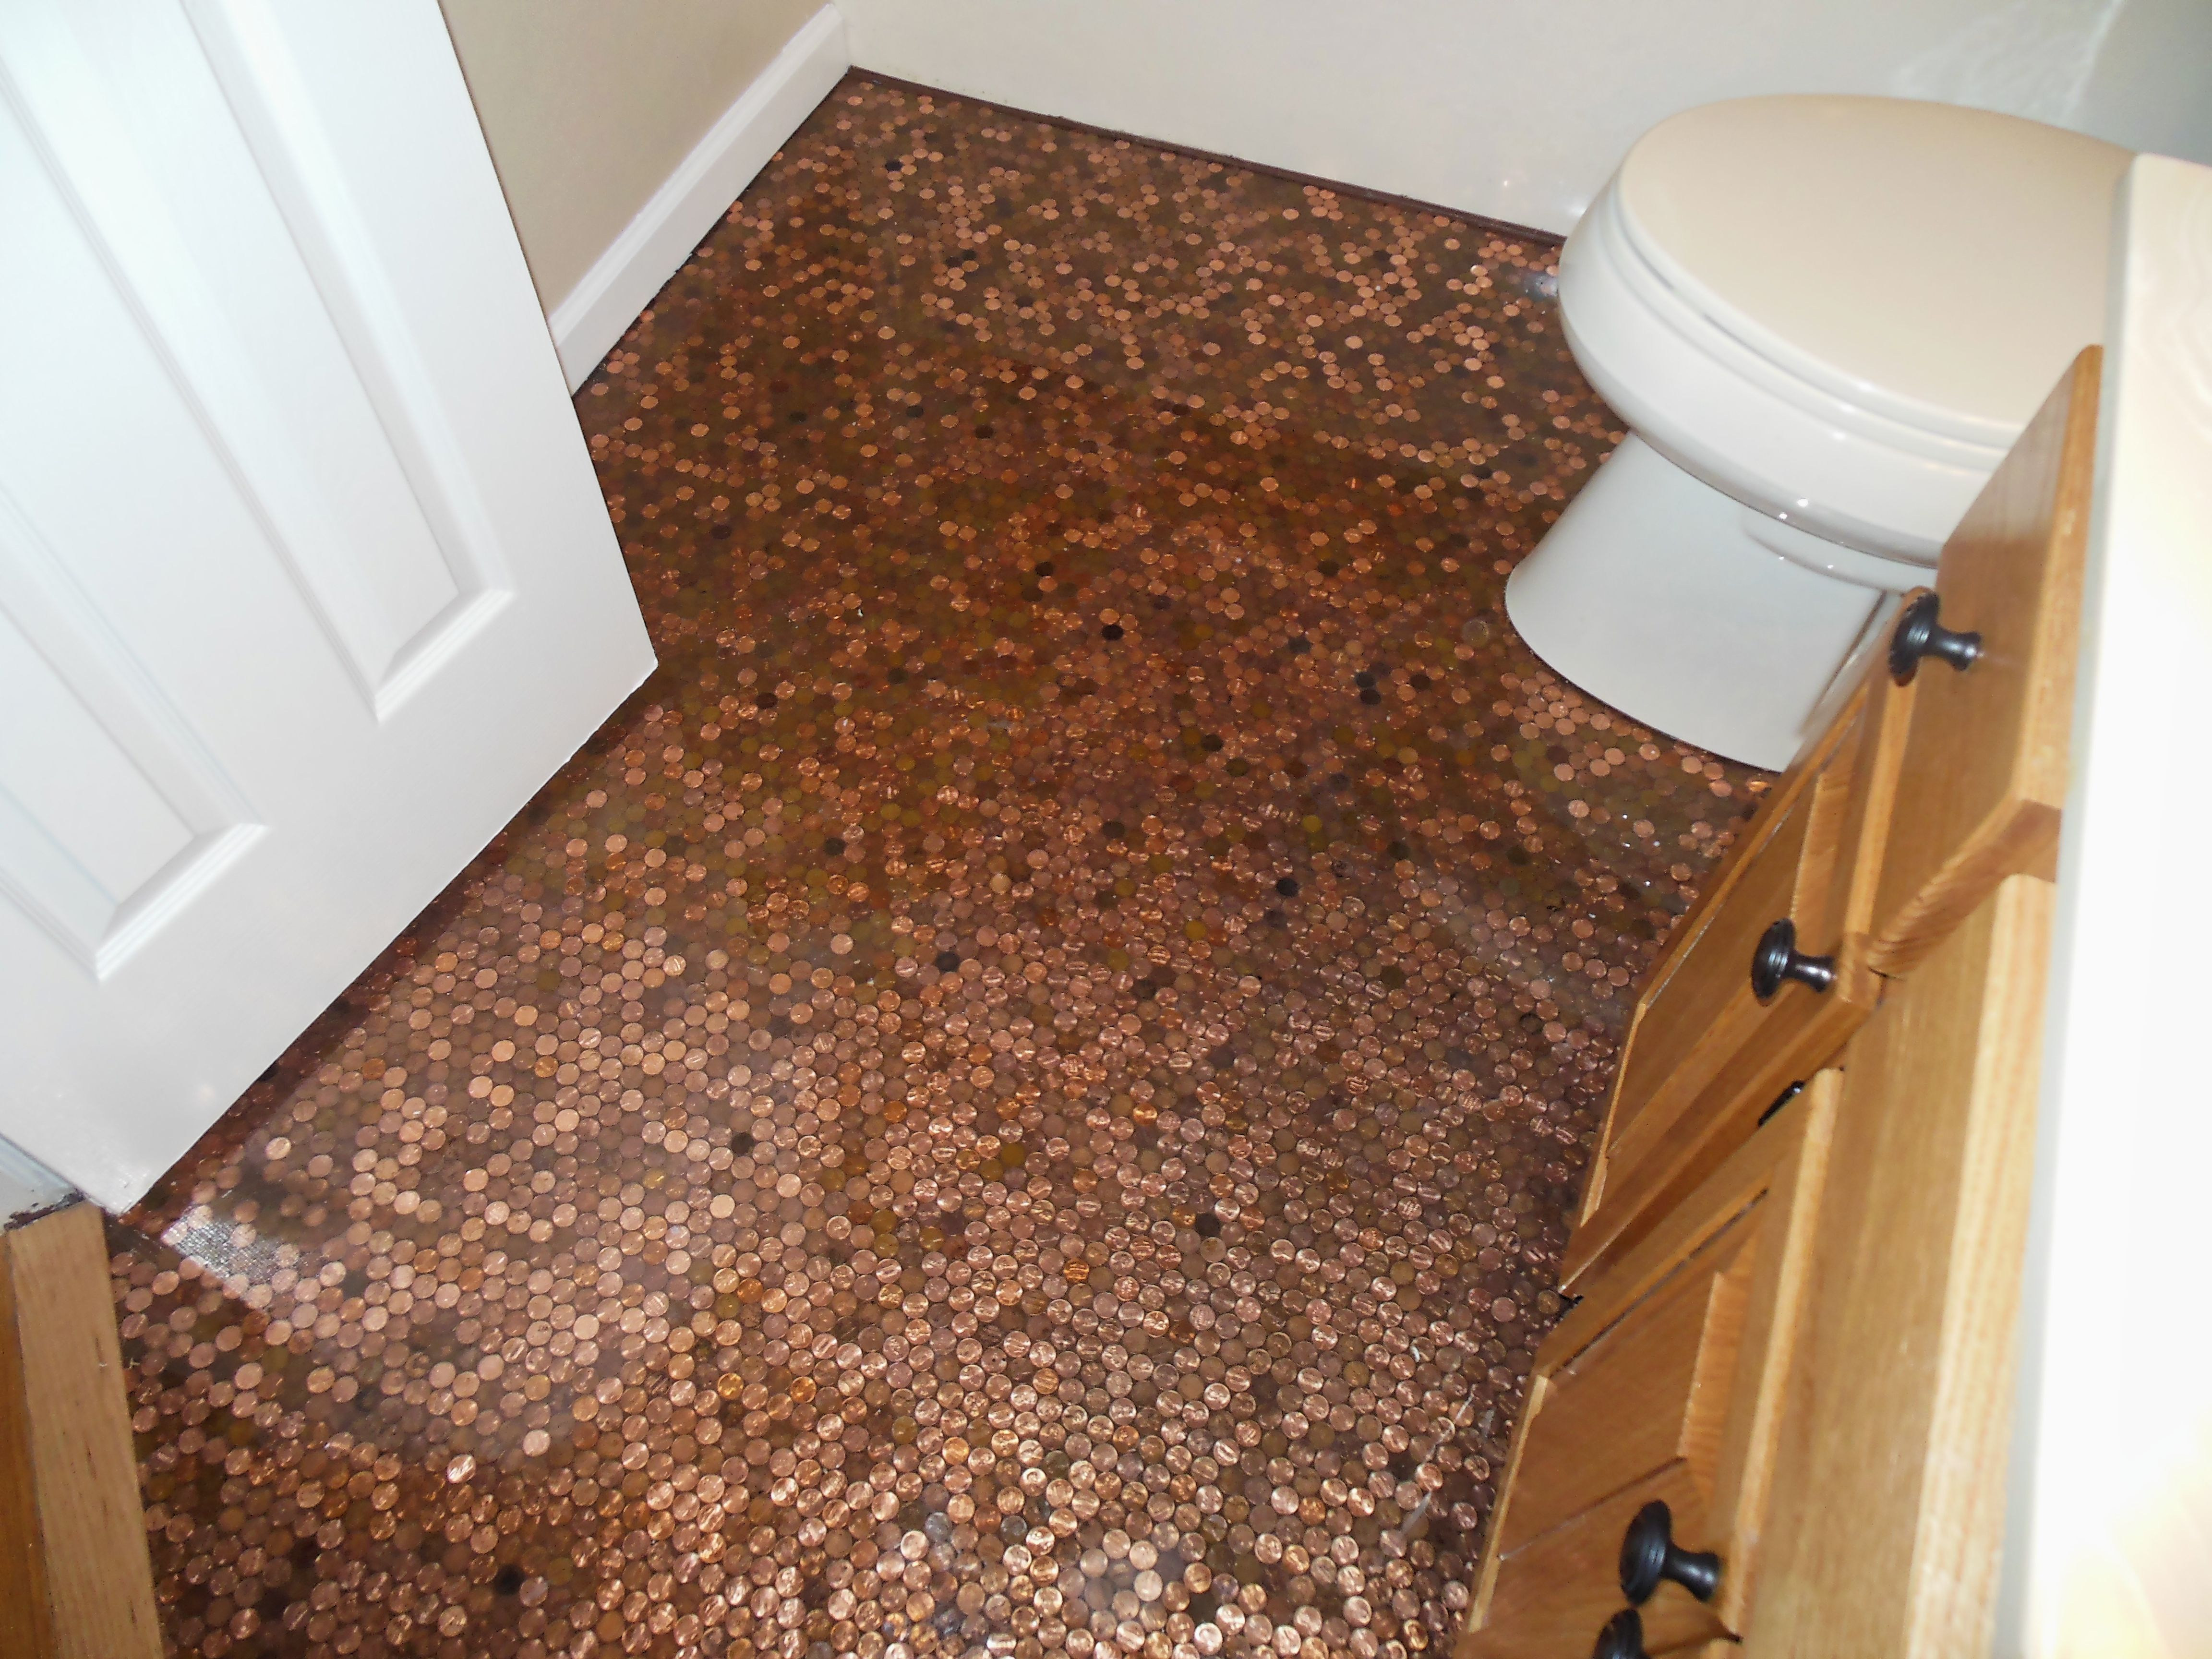 Epoxy floor bathroom - Where To Buy Epoxy Resin